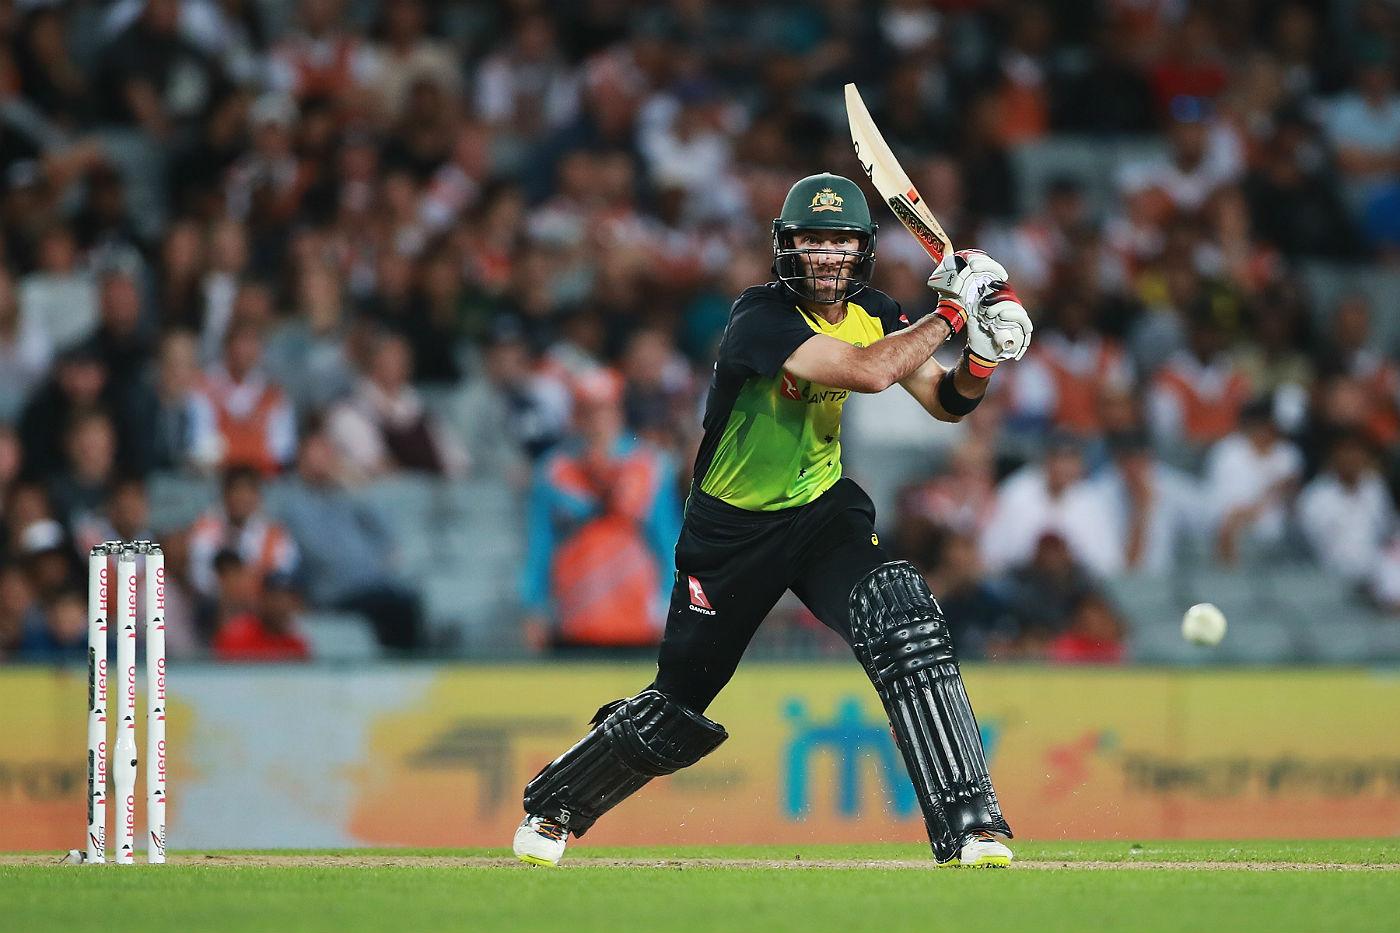 Pakistan retain No 1 World T20 ranking following ICC Error